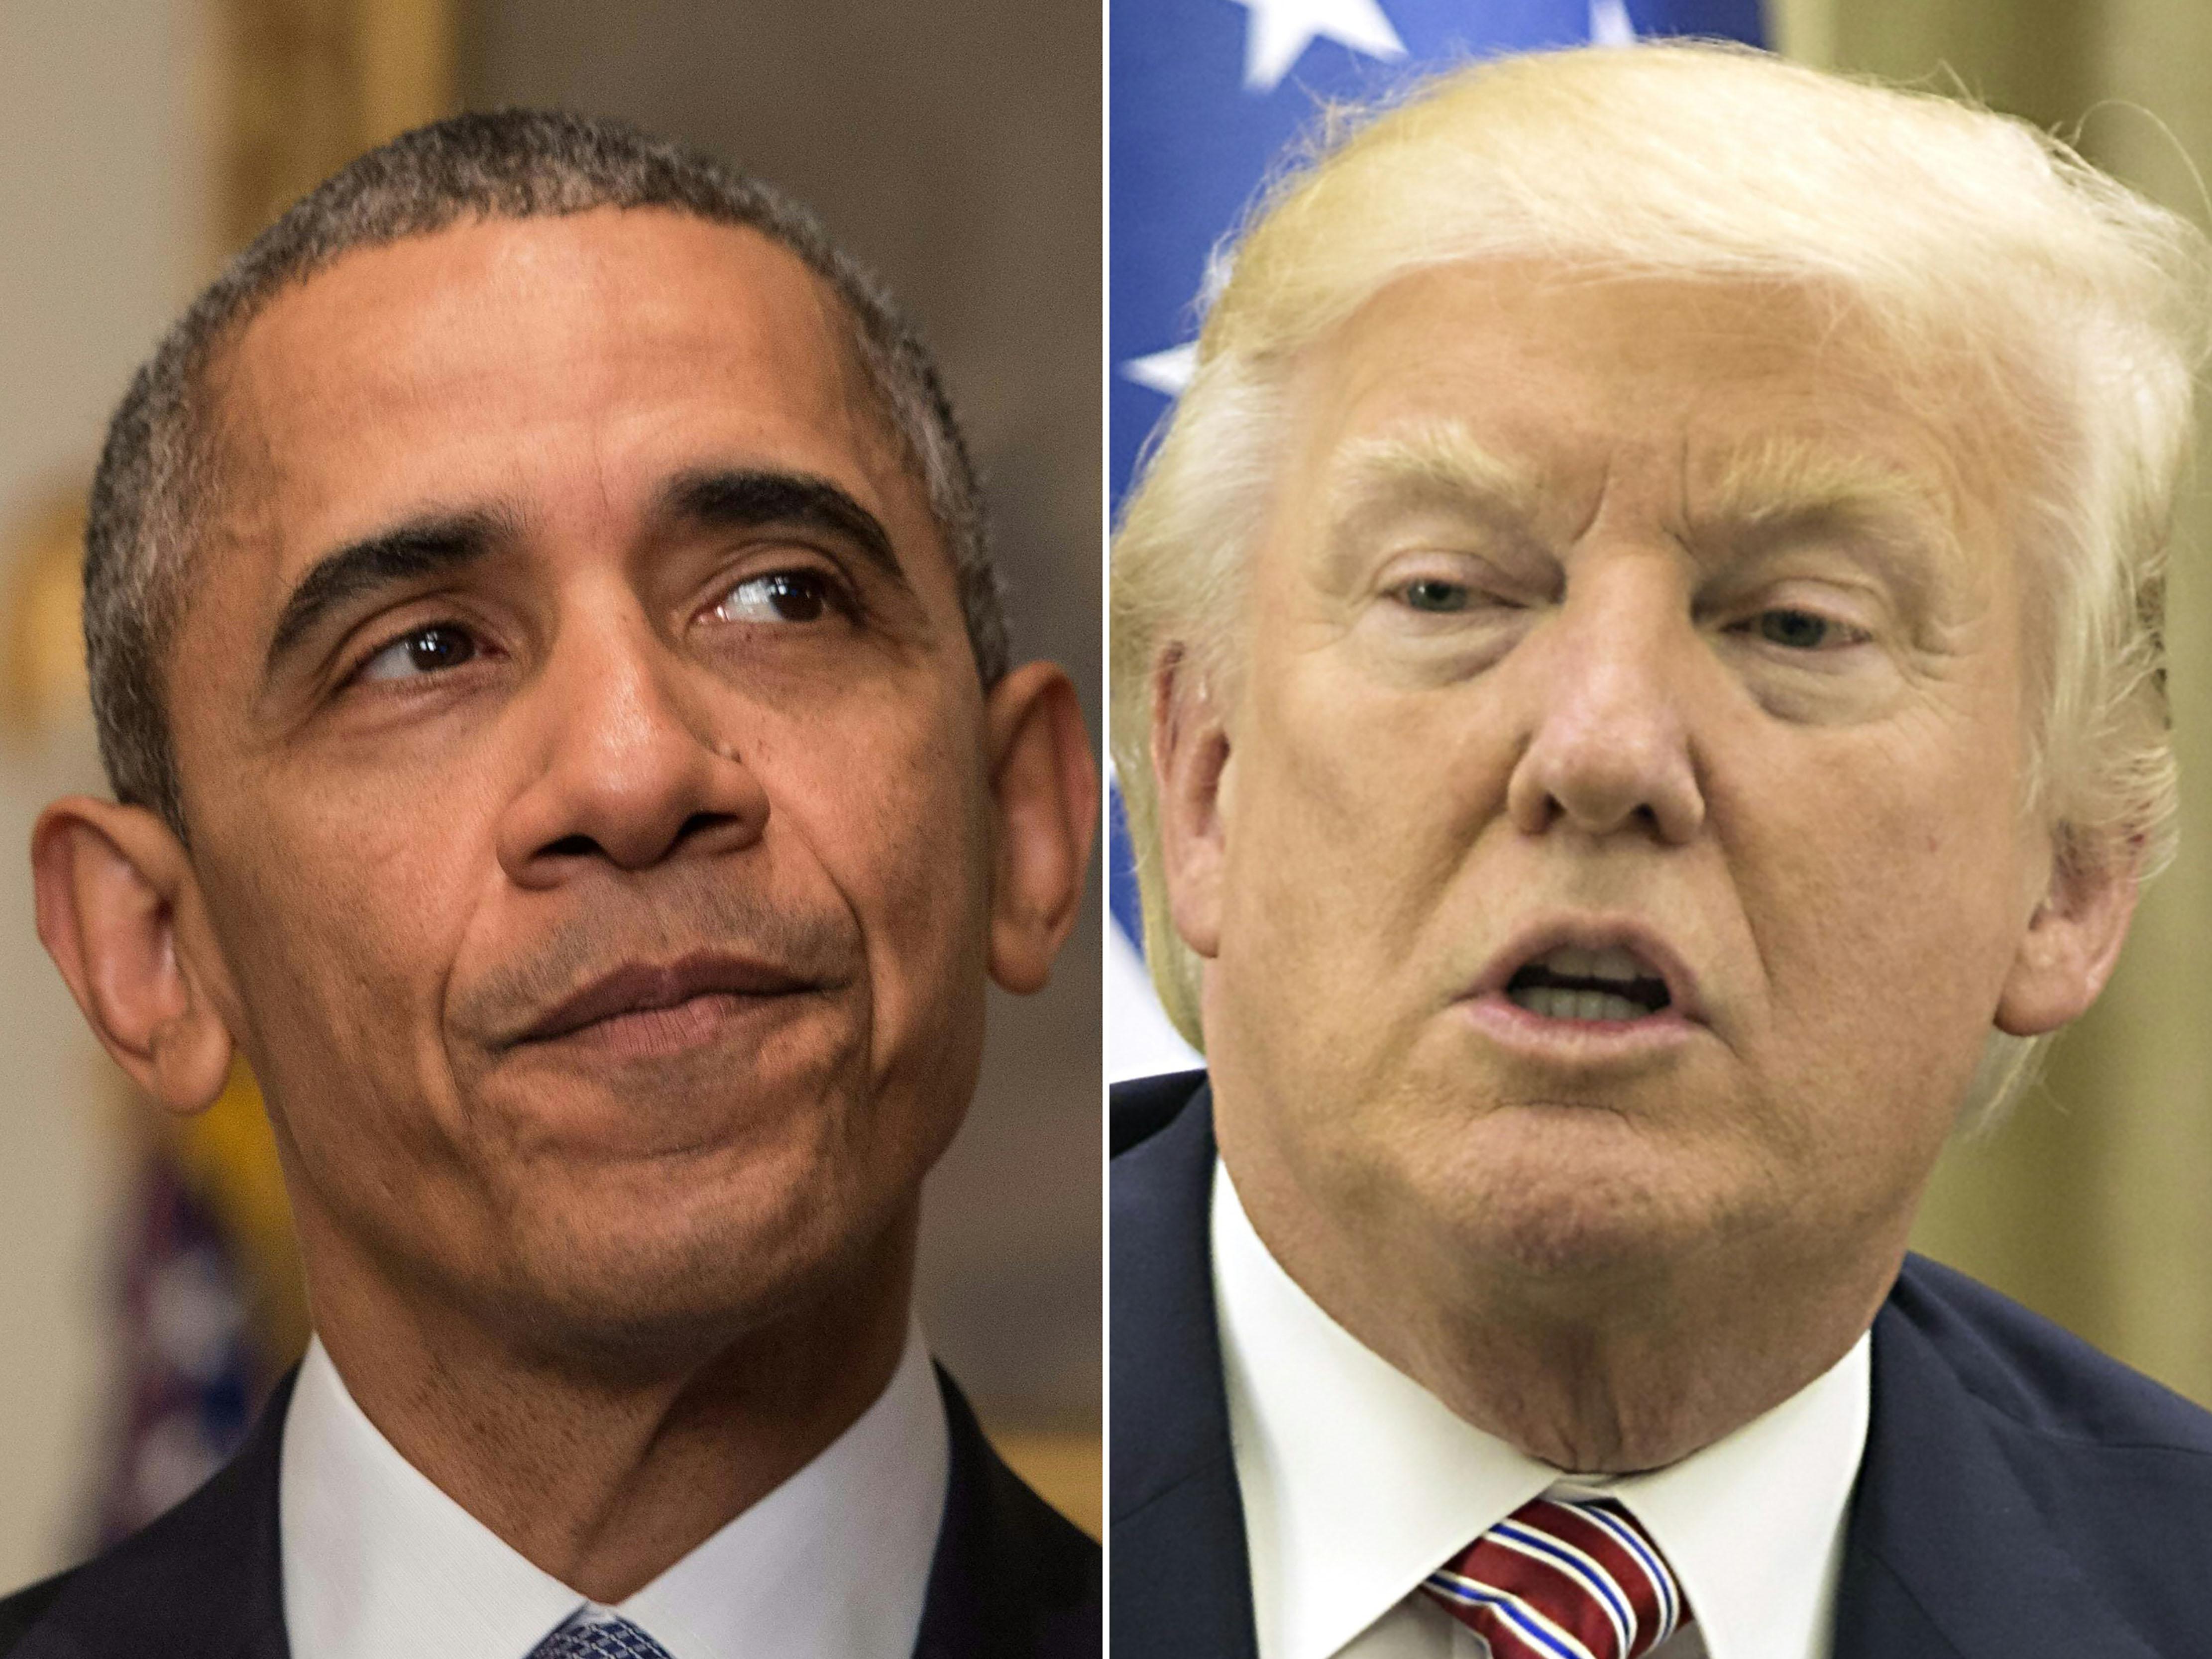 washingtonpost.com - Meg Kelly - The 'Trump economy' versus the 'Obama economy'